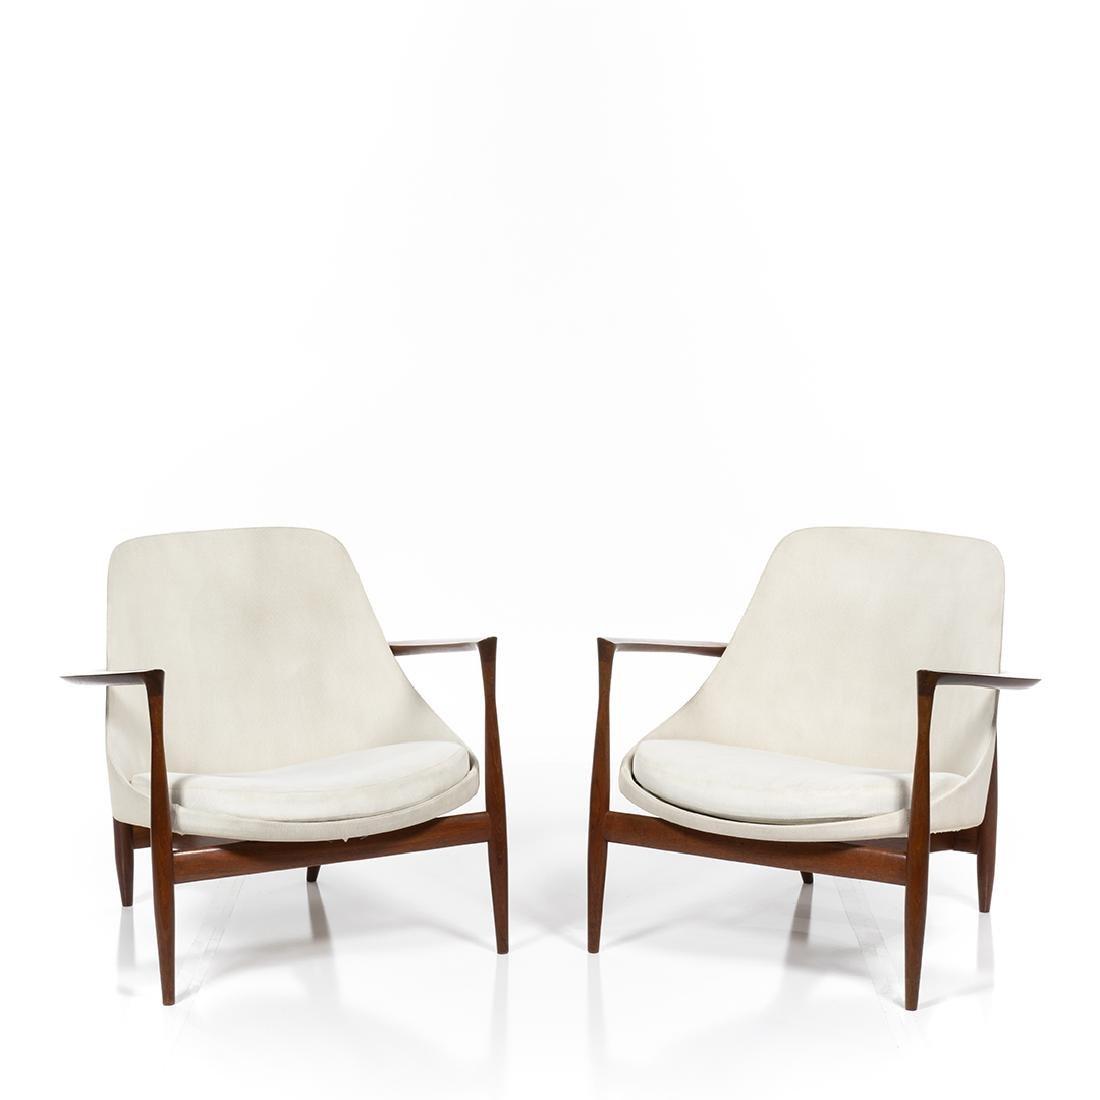 IB Kofod Larsen Elizabeth Chairs - 2